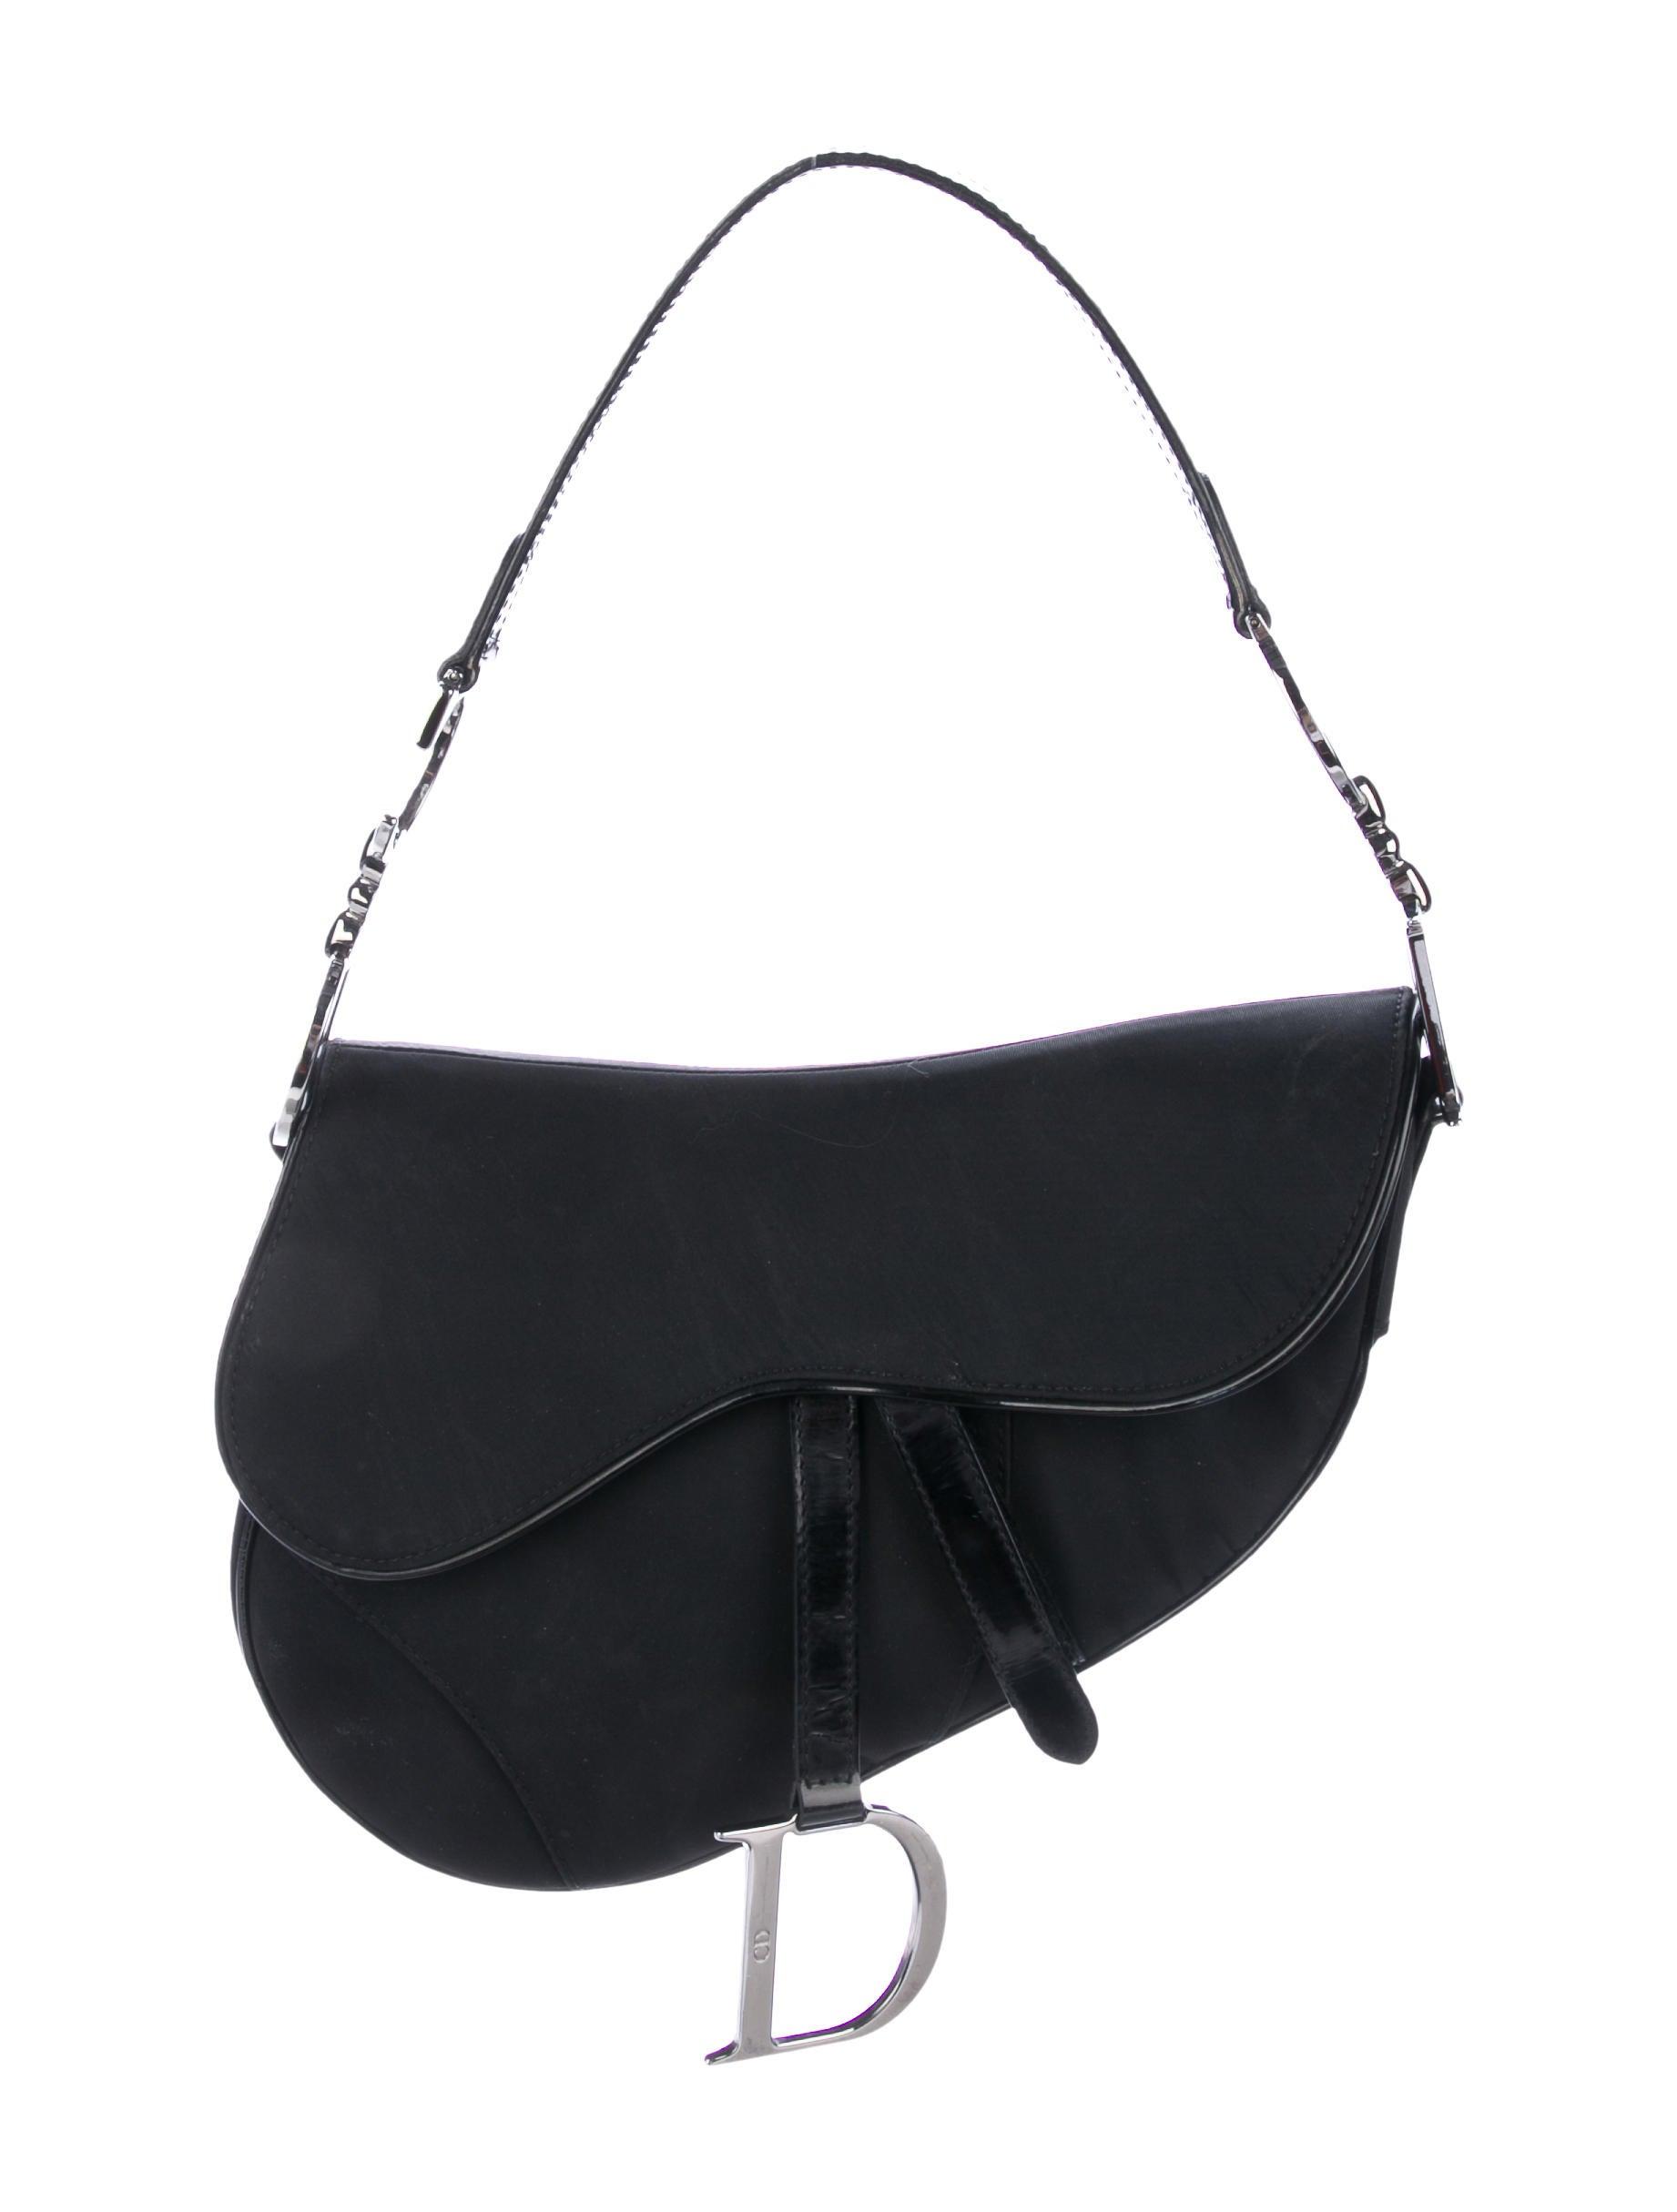 27244c3a4c29 Christian Dior Patent Leather-Trimmed Saddle Bag - Handbags ...